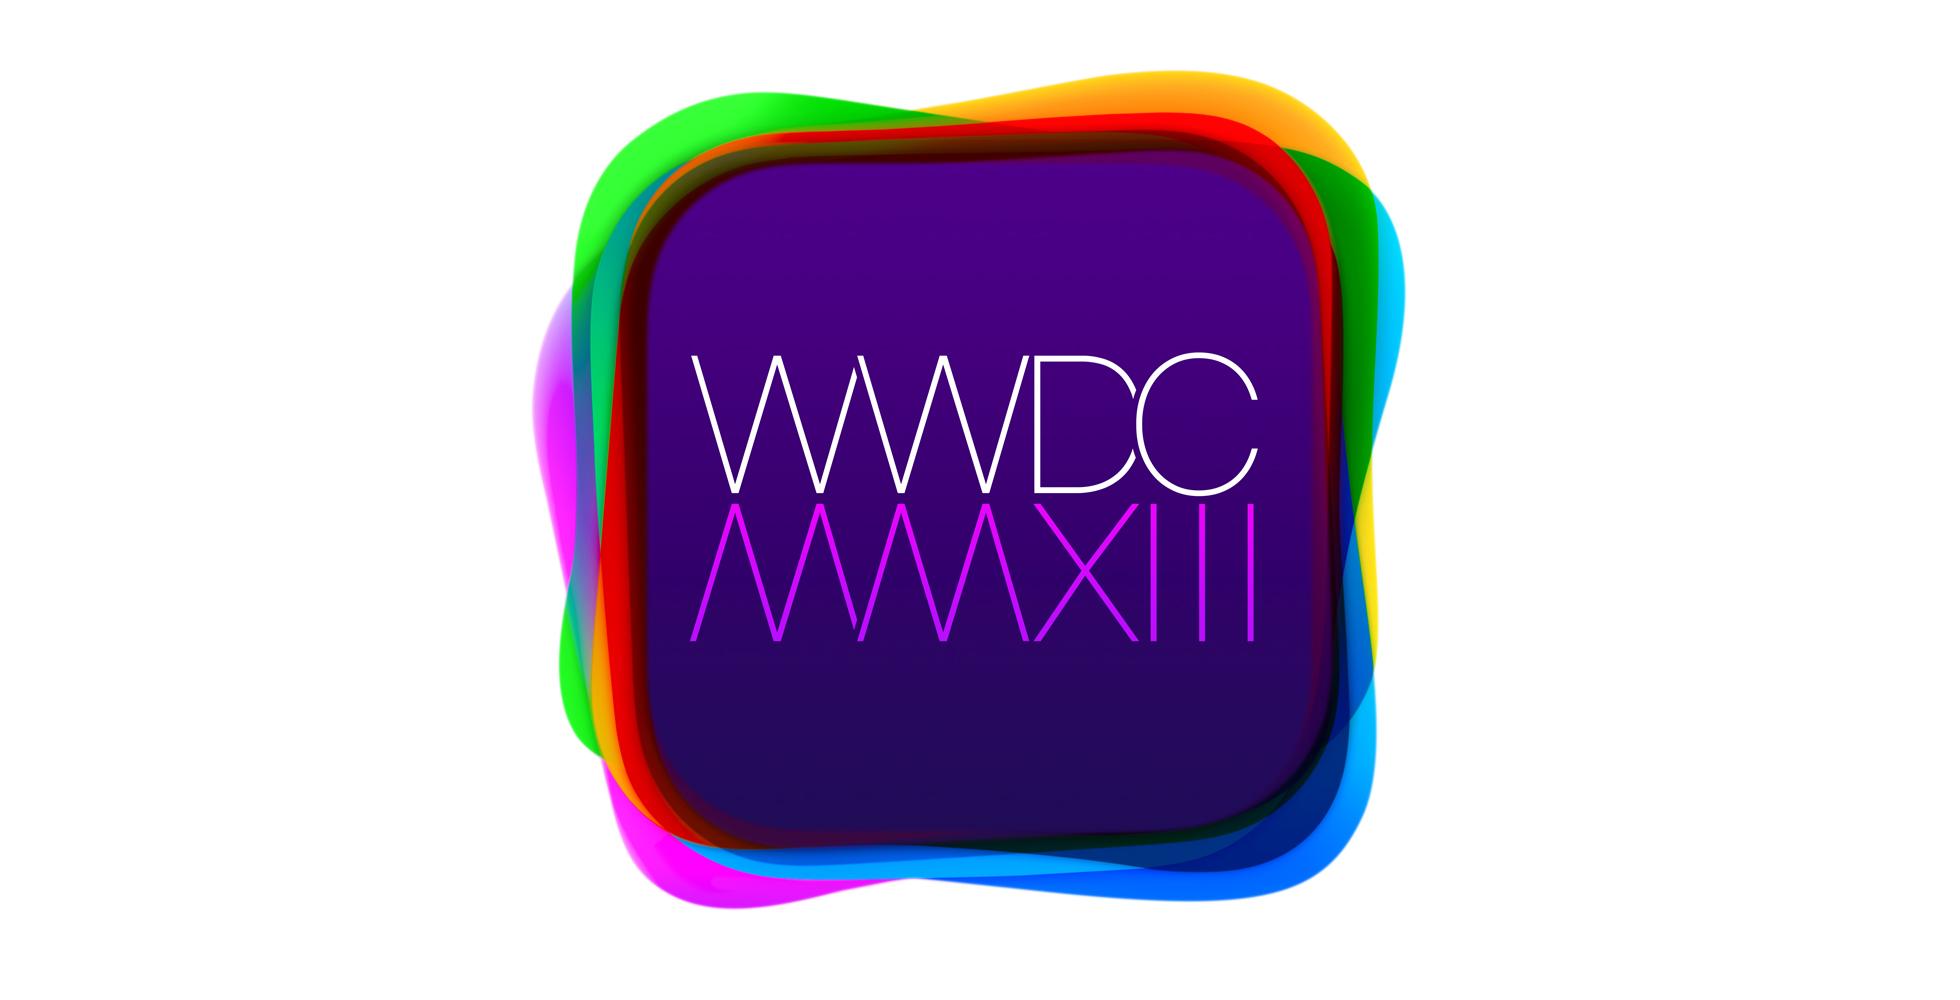 WWDC 2013 이벤트 후기